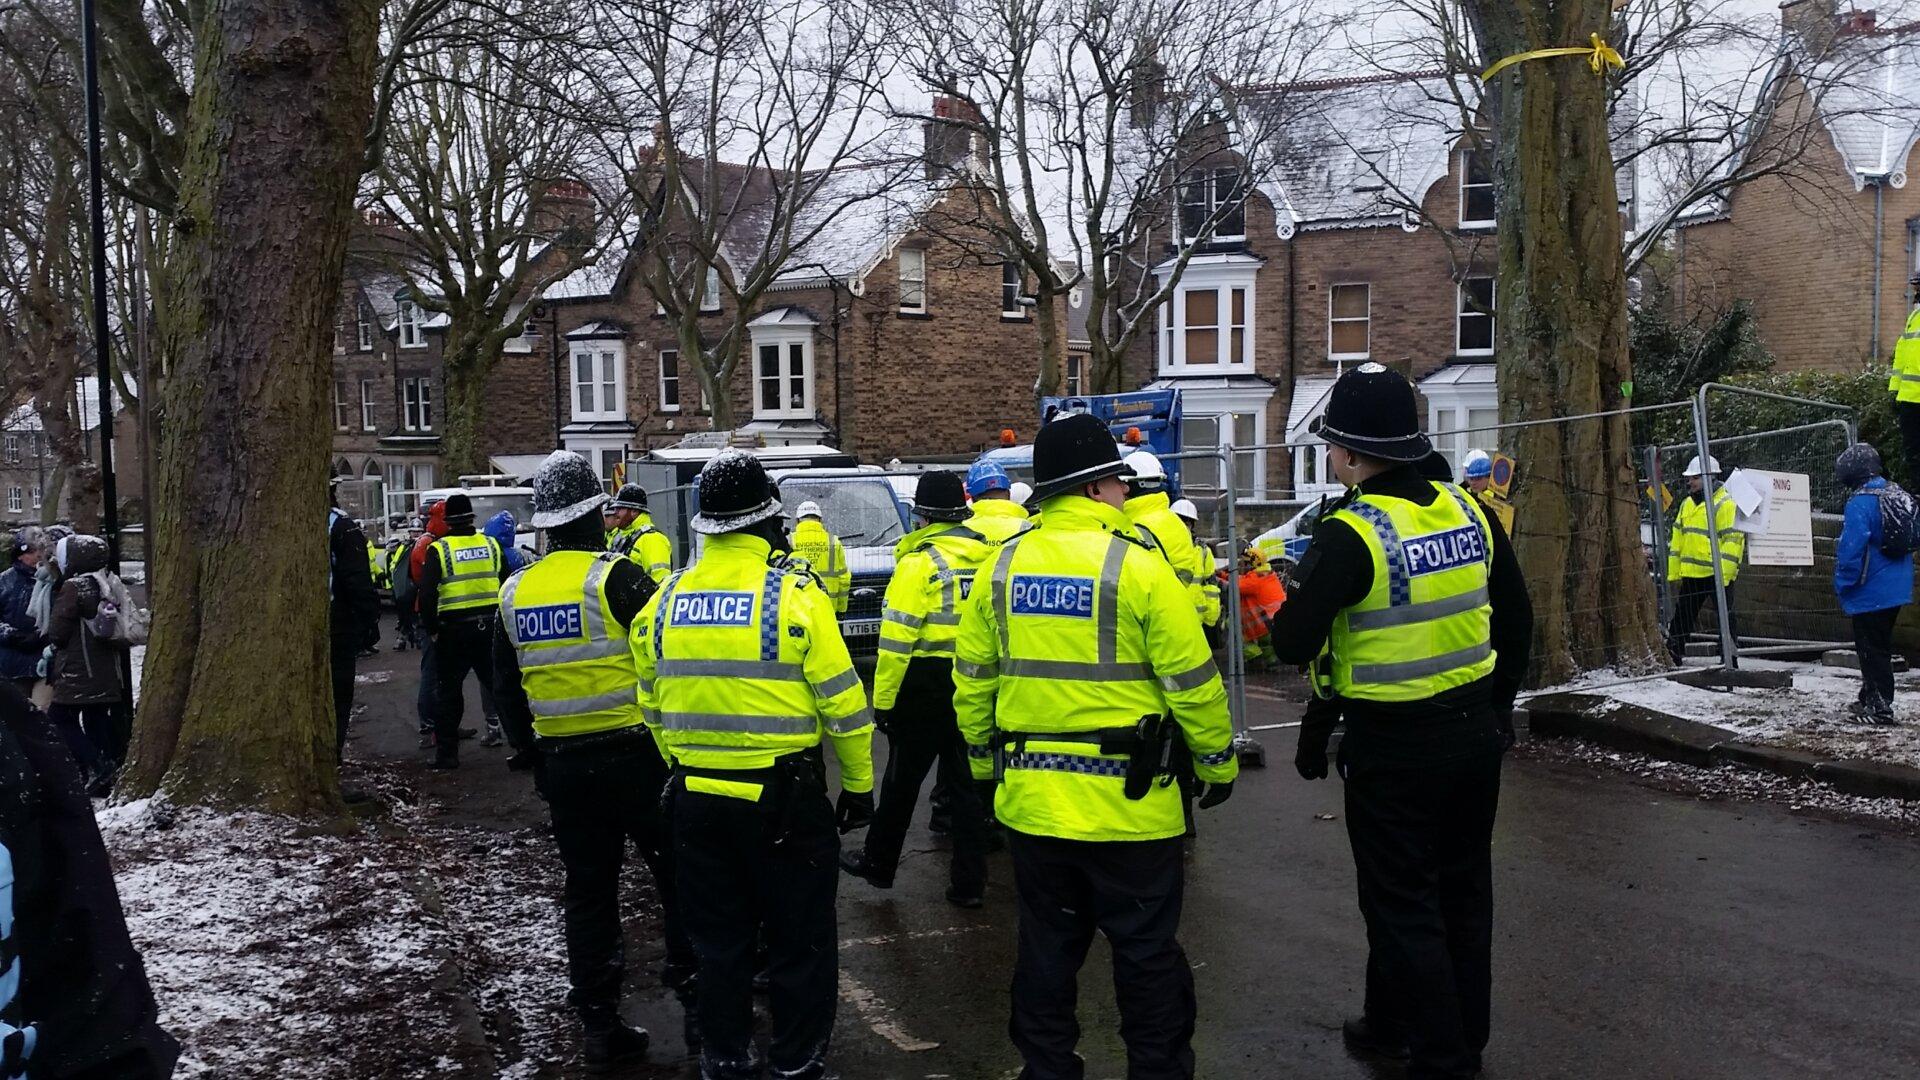 Street tree police